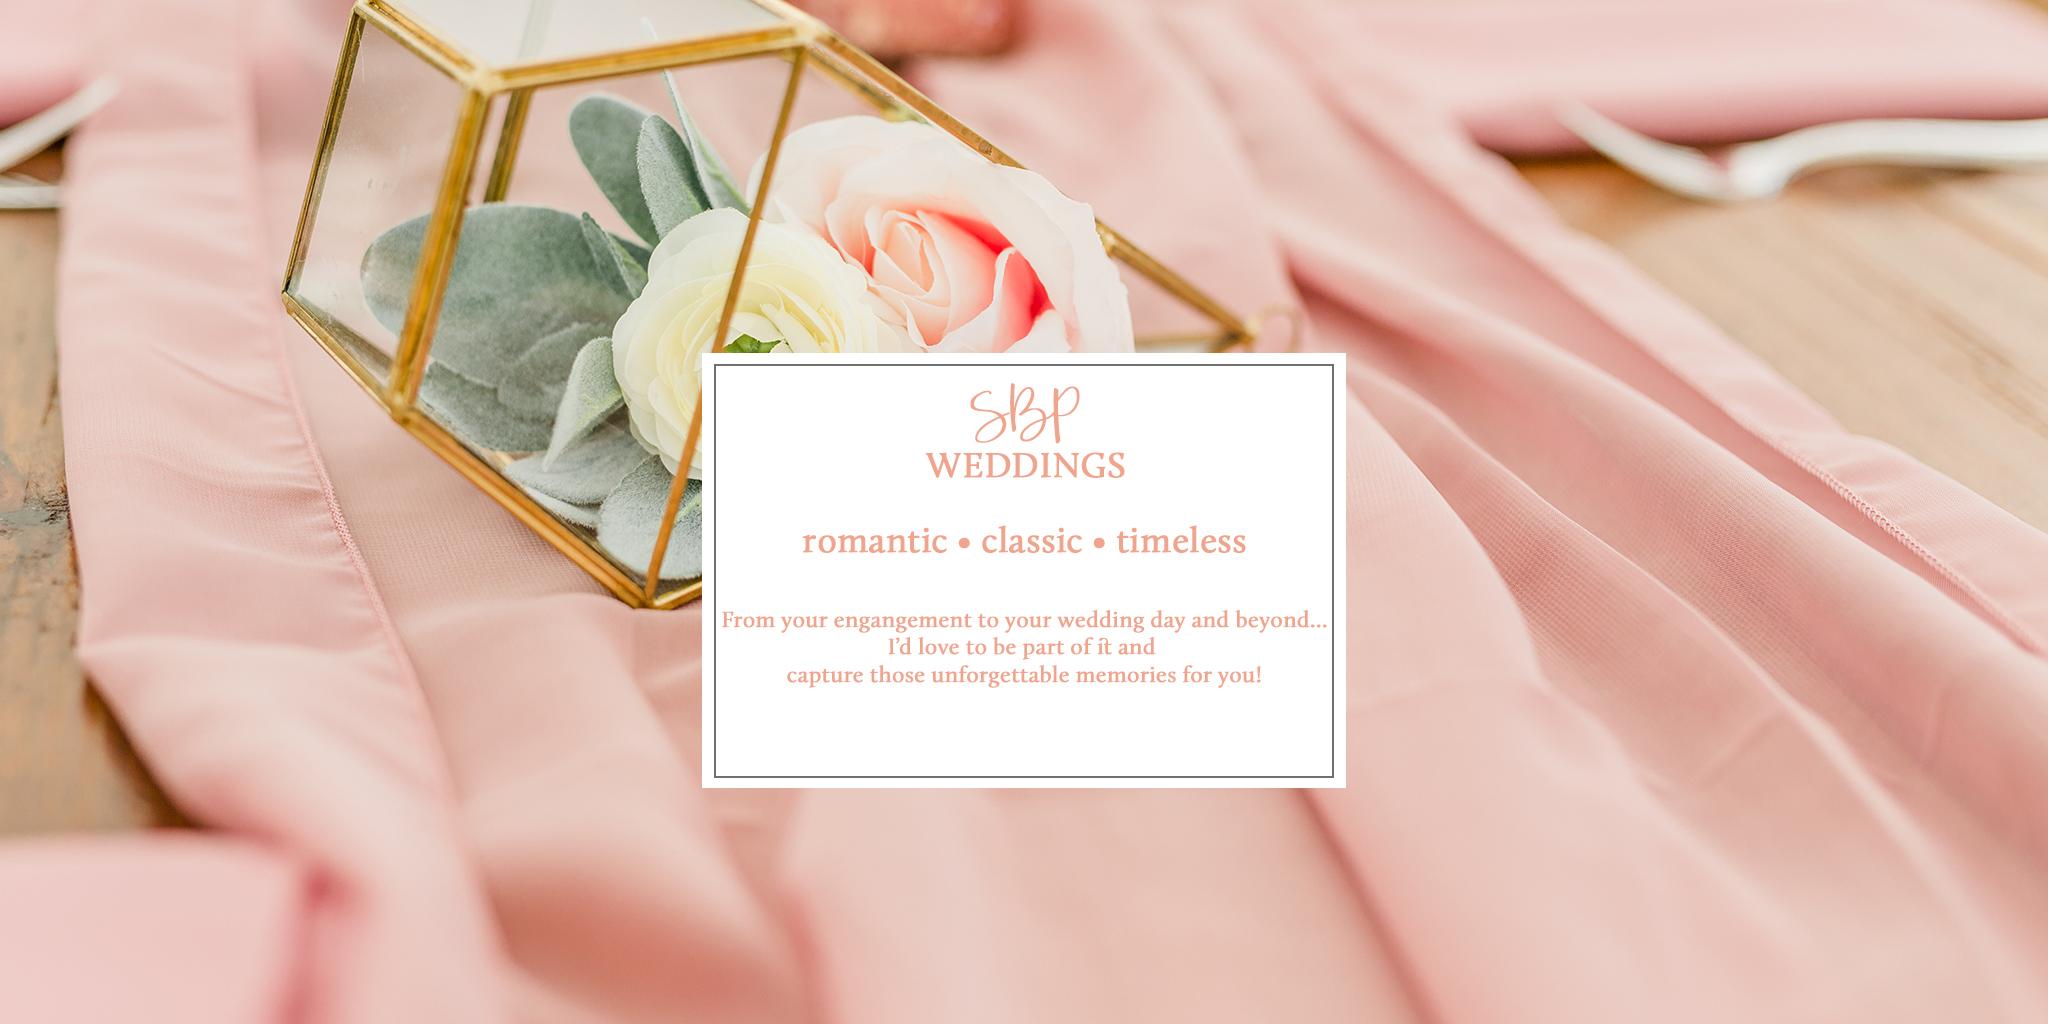 wedding website 2.jpg